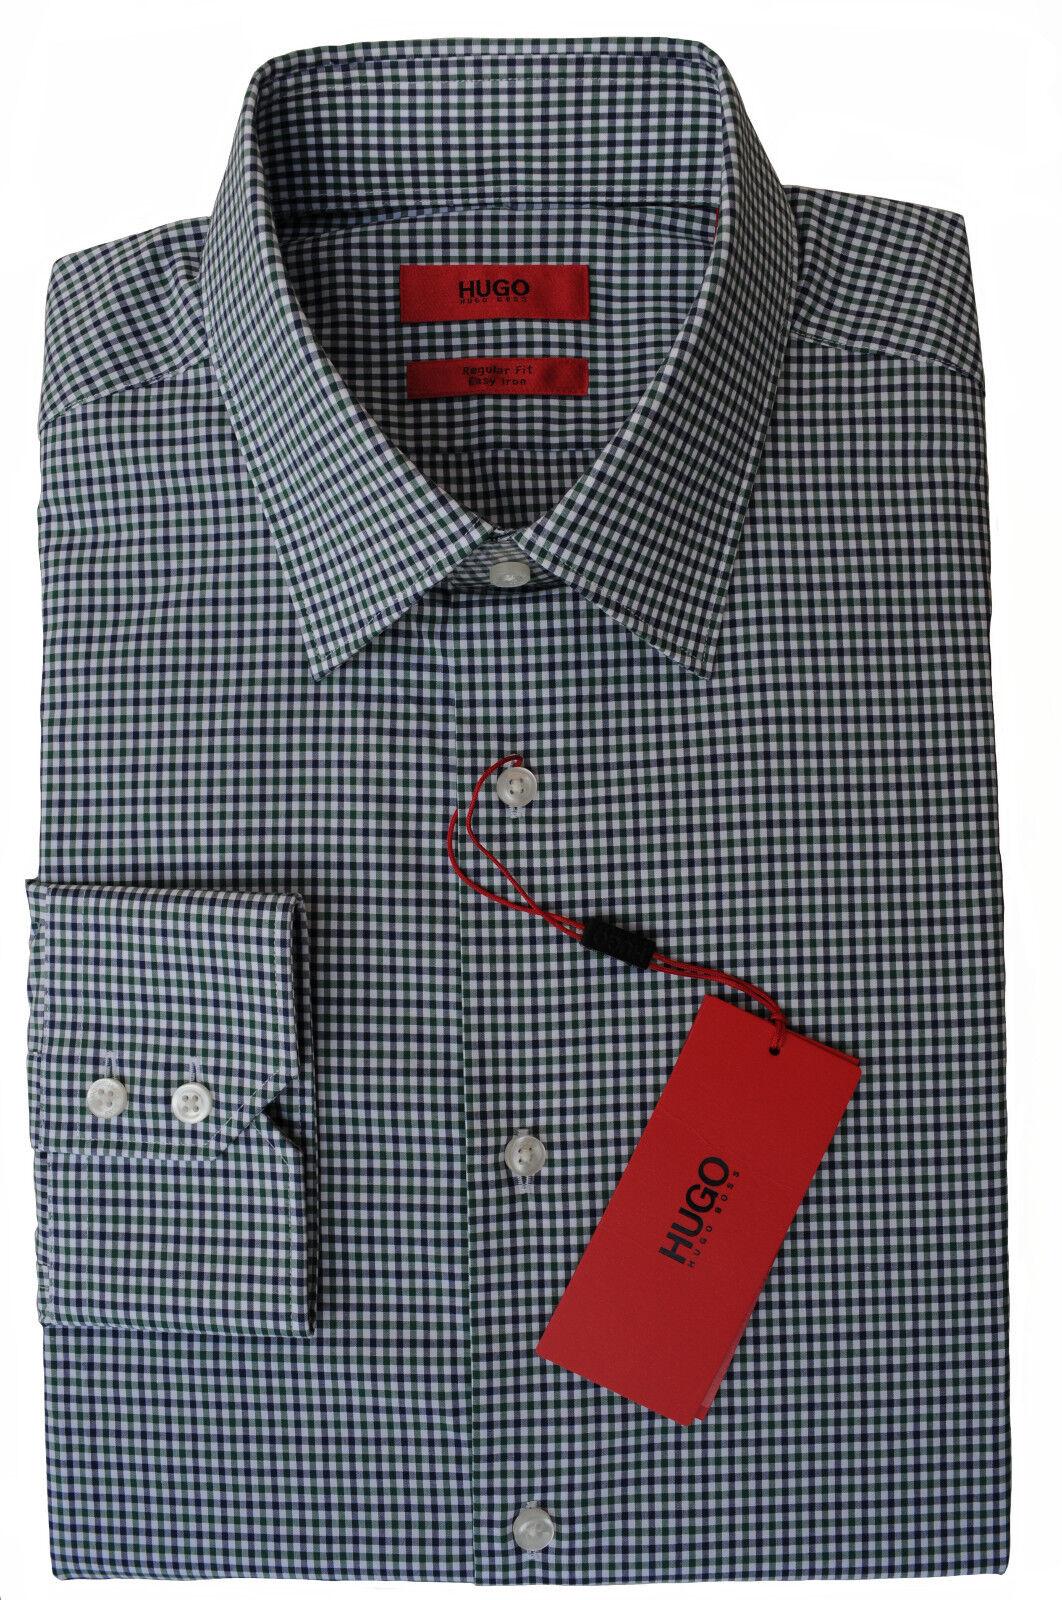 9b3f80196 40 HUGO BOSS C-ENZO REGULAR FIT IRON zu Jeans 50368823 HEMD EASY  nynjsy19991-Formal Shirts